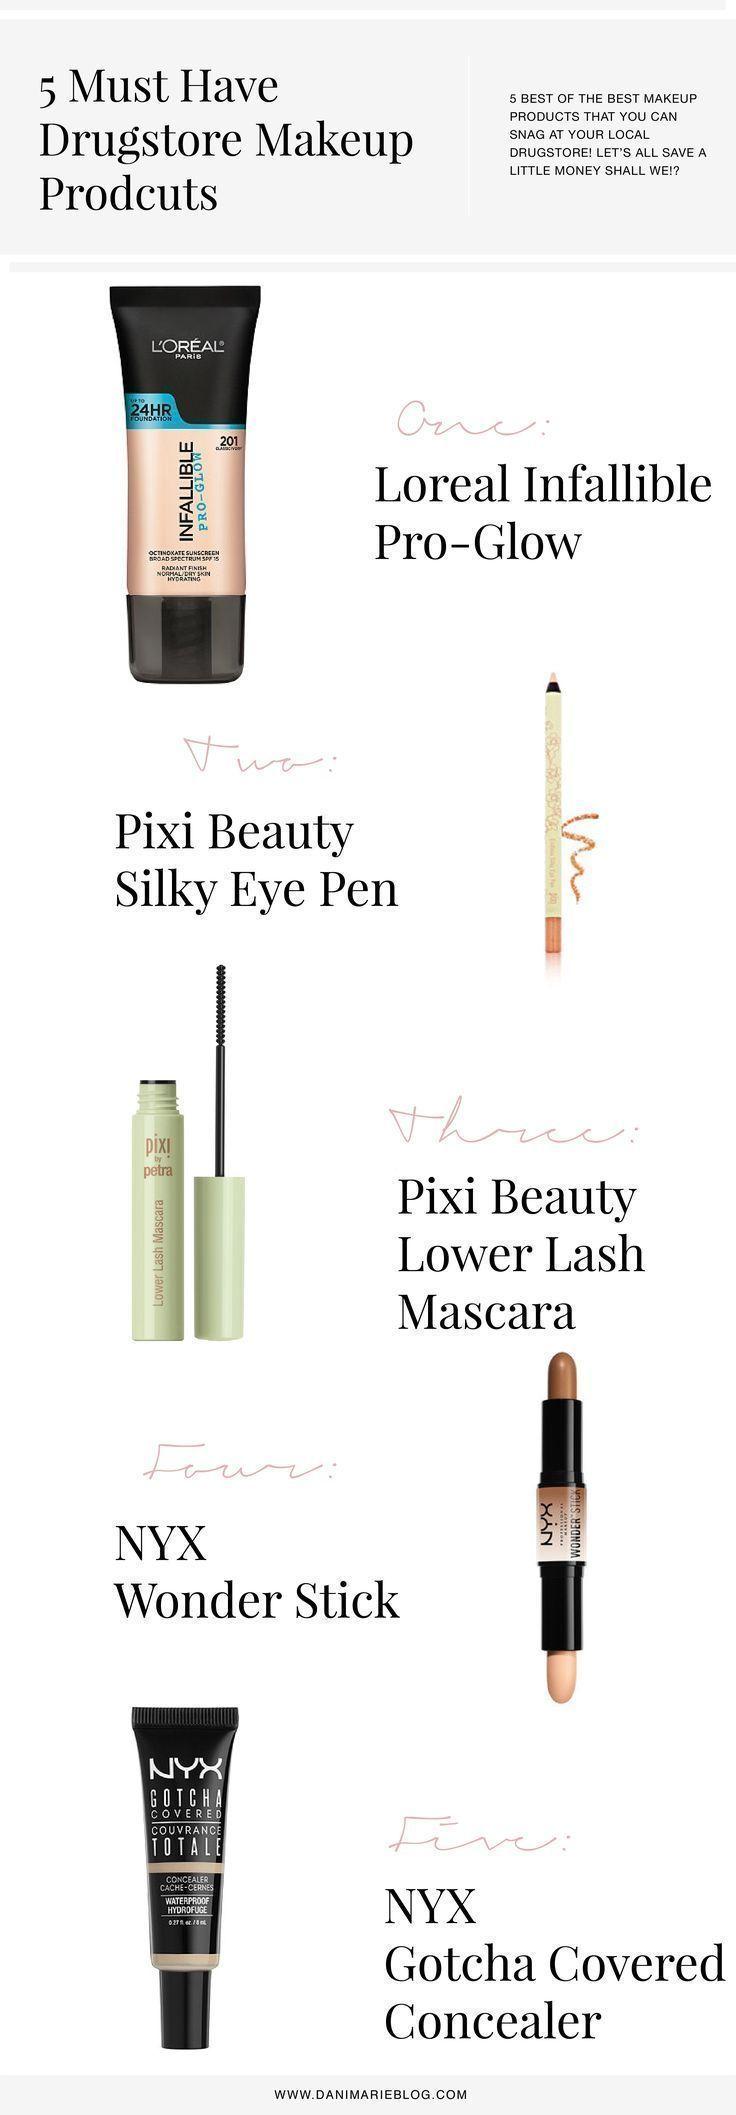 5 Must Have Drugstore Makeup Products #FaceMoisturizerForDrySkin #GlowingSkinRou… – #drugs…